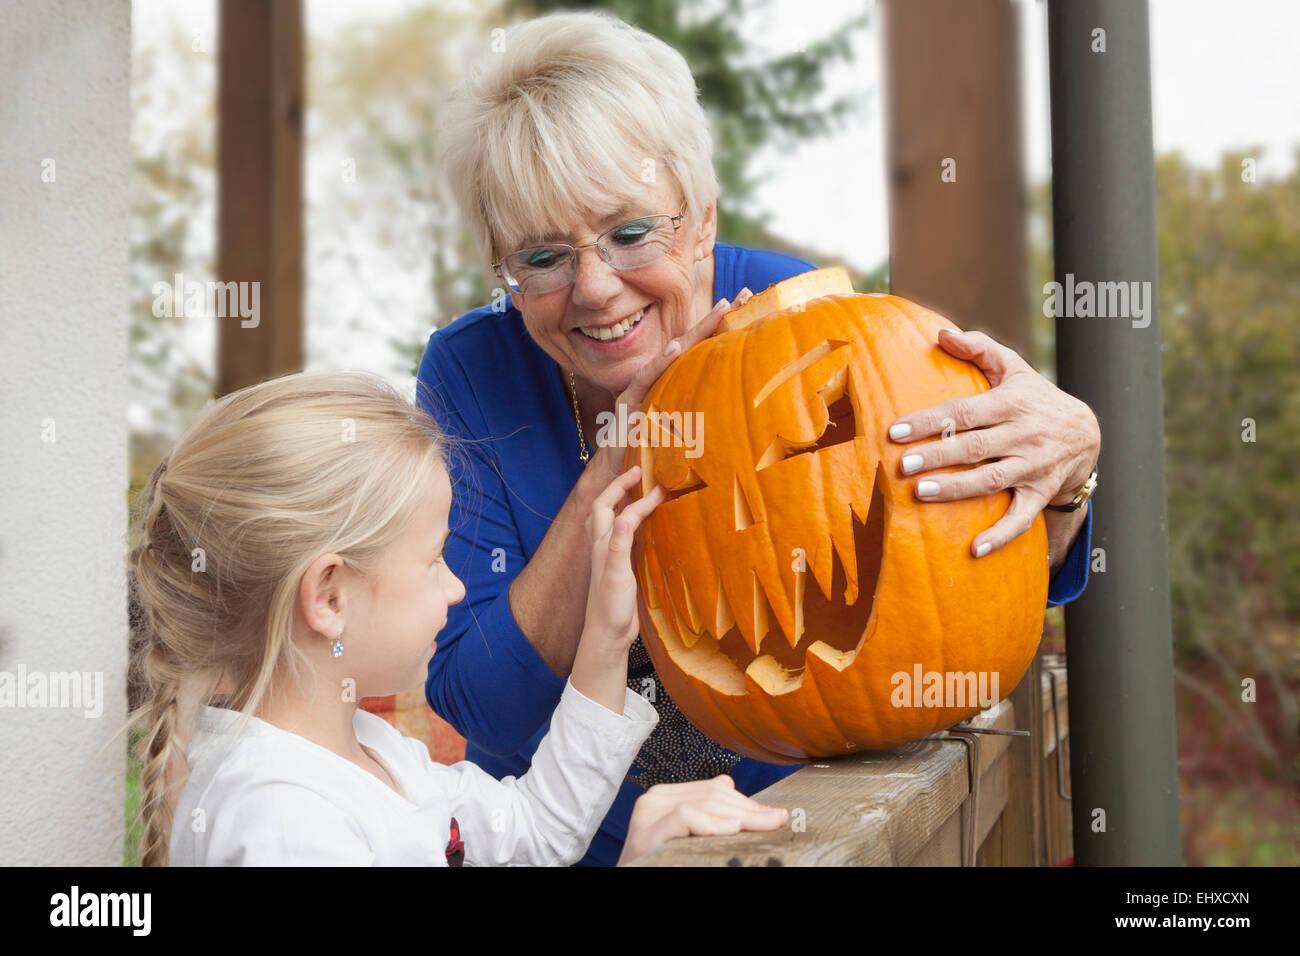 Senior woman showing Halloween pumpkin to her granddaughter, Bavaria, Germany - Stock Image